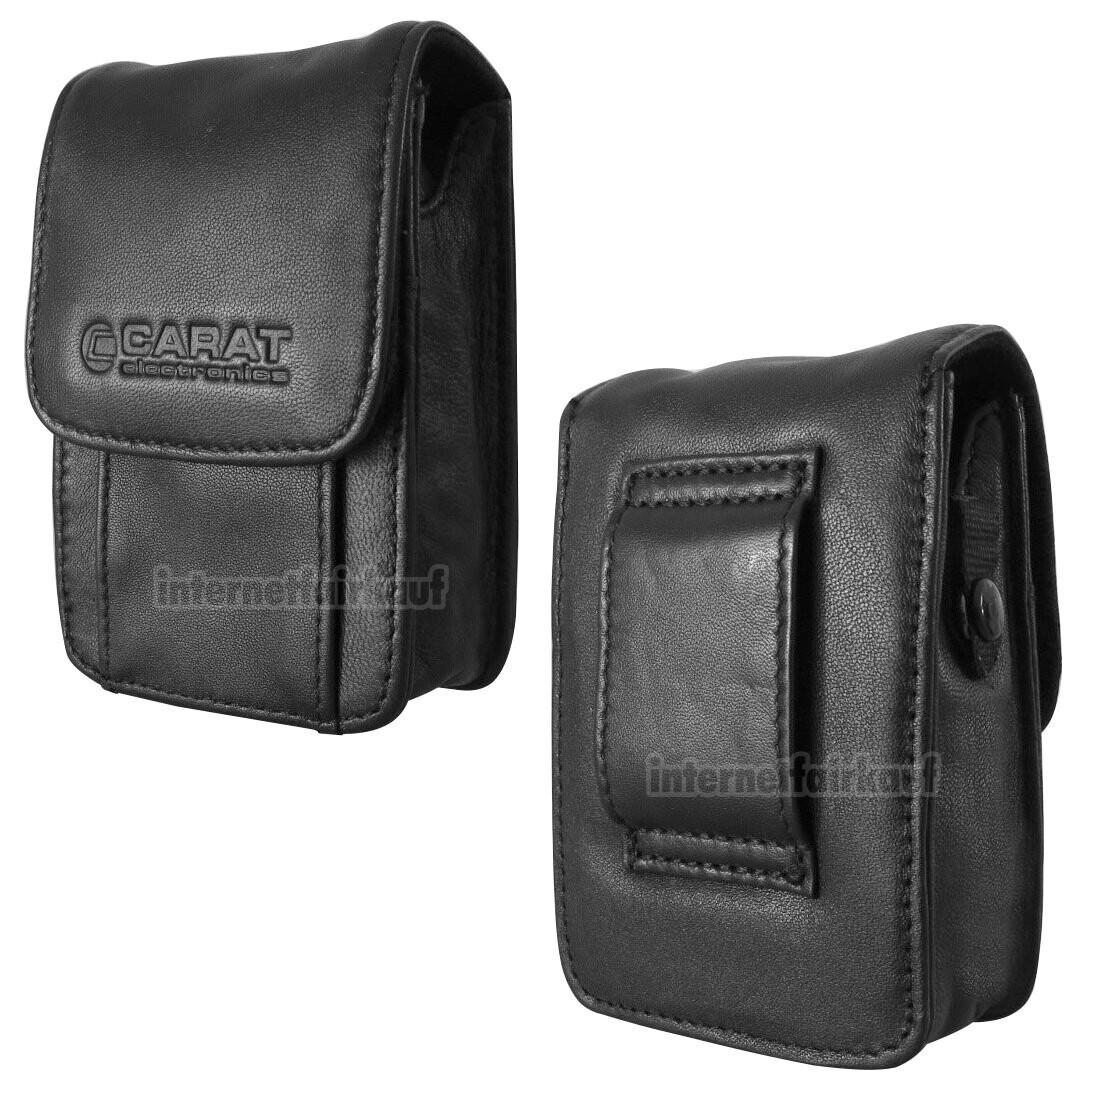 Kameratasche passend für Panasonic Lumix DC-TZ41 TZ36 TZ31 - Leder Etui